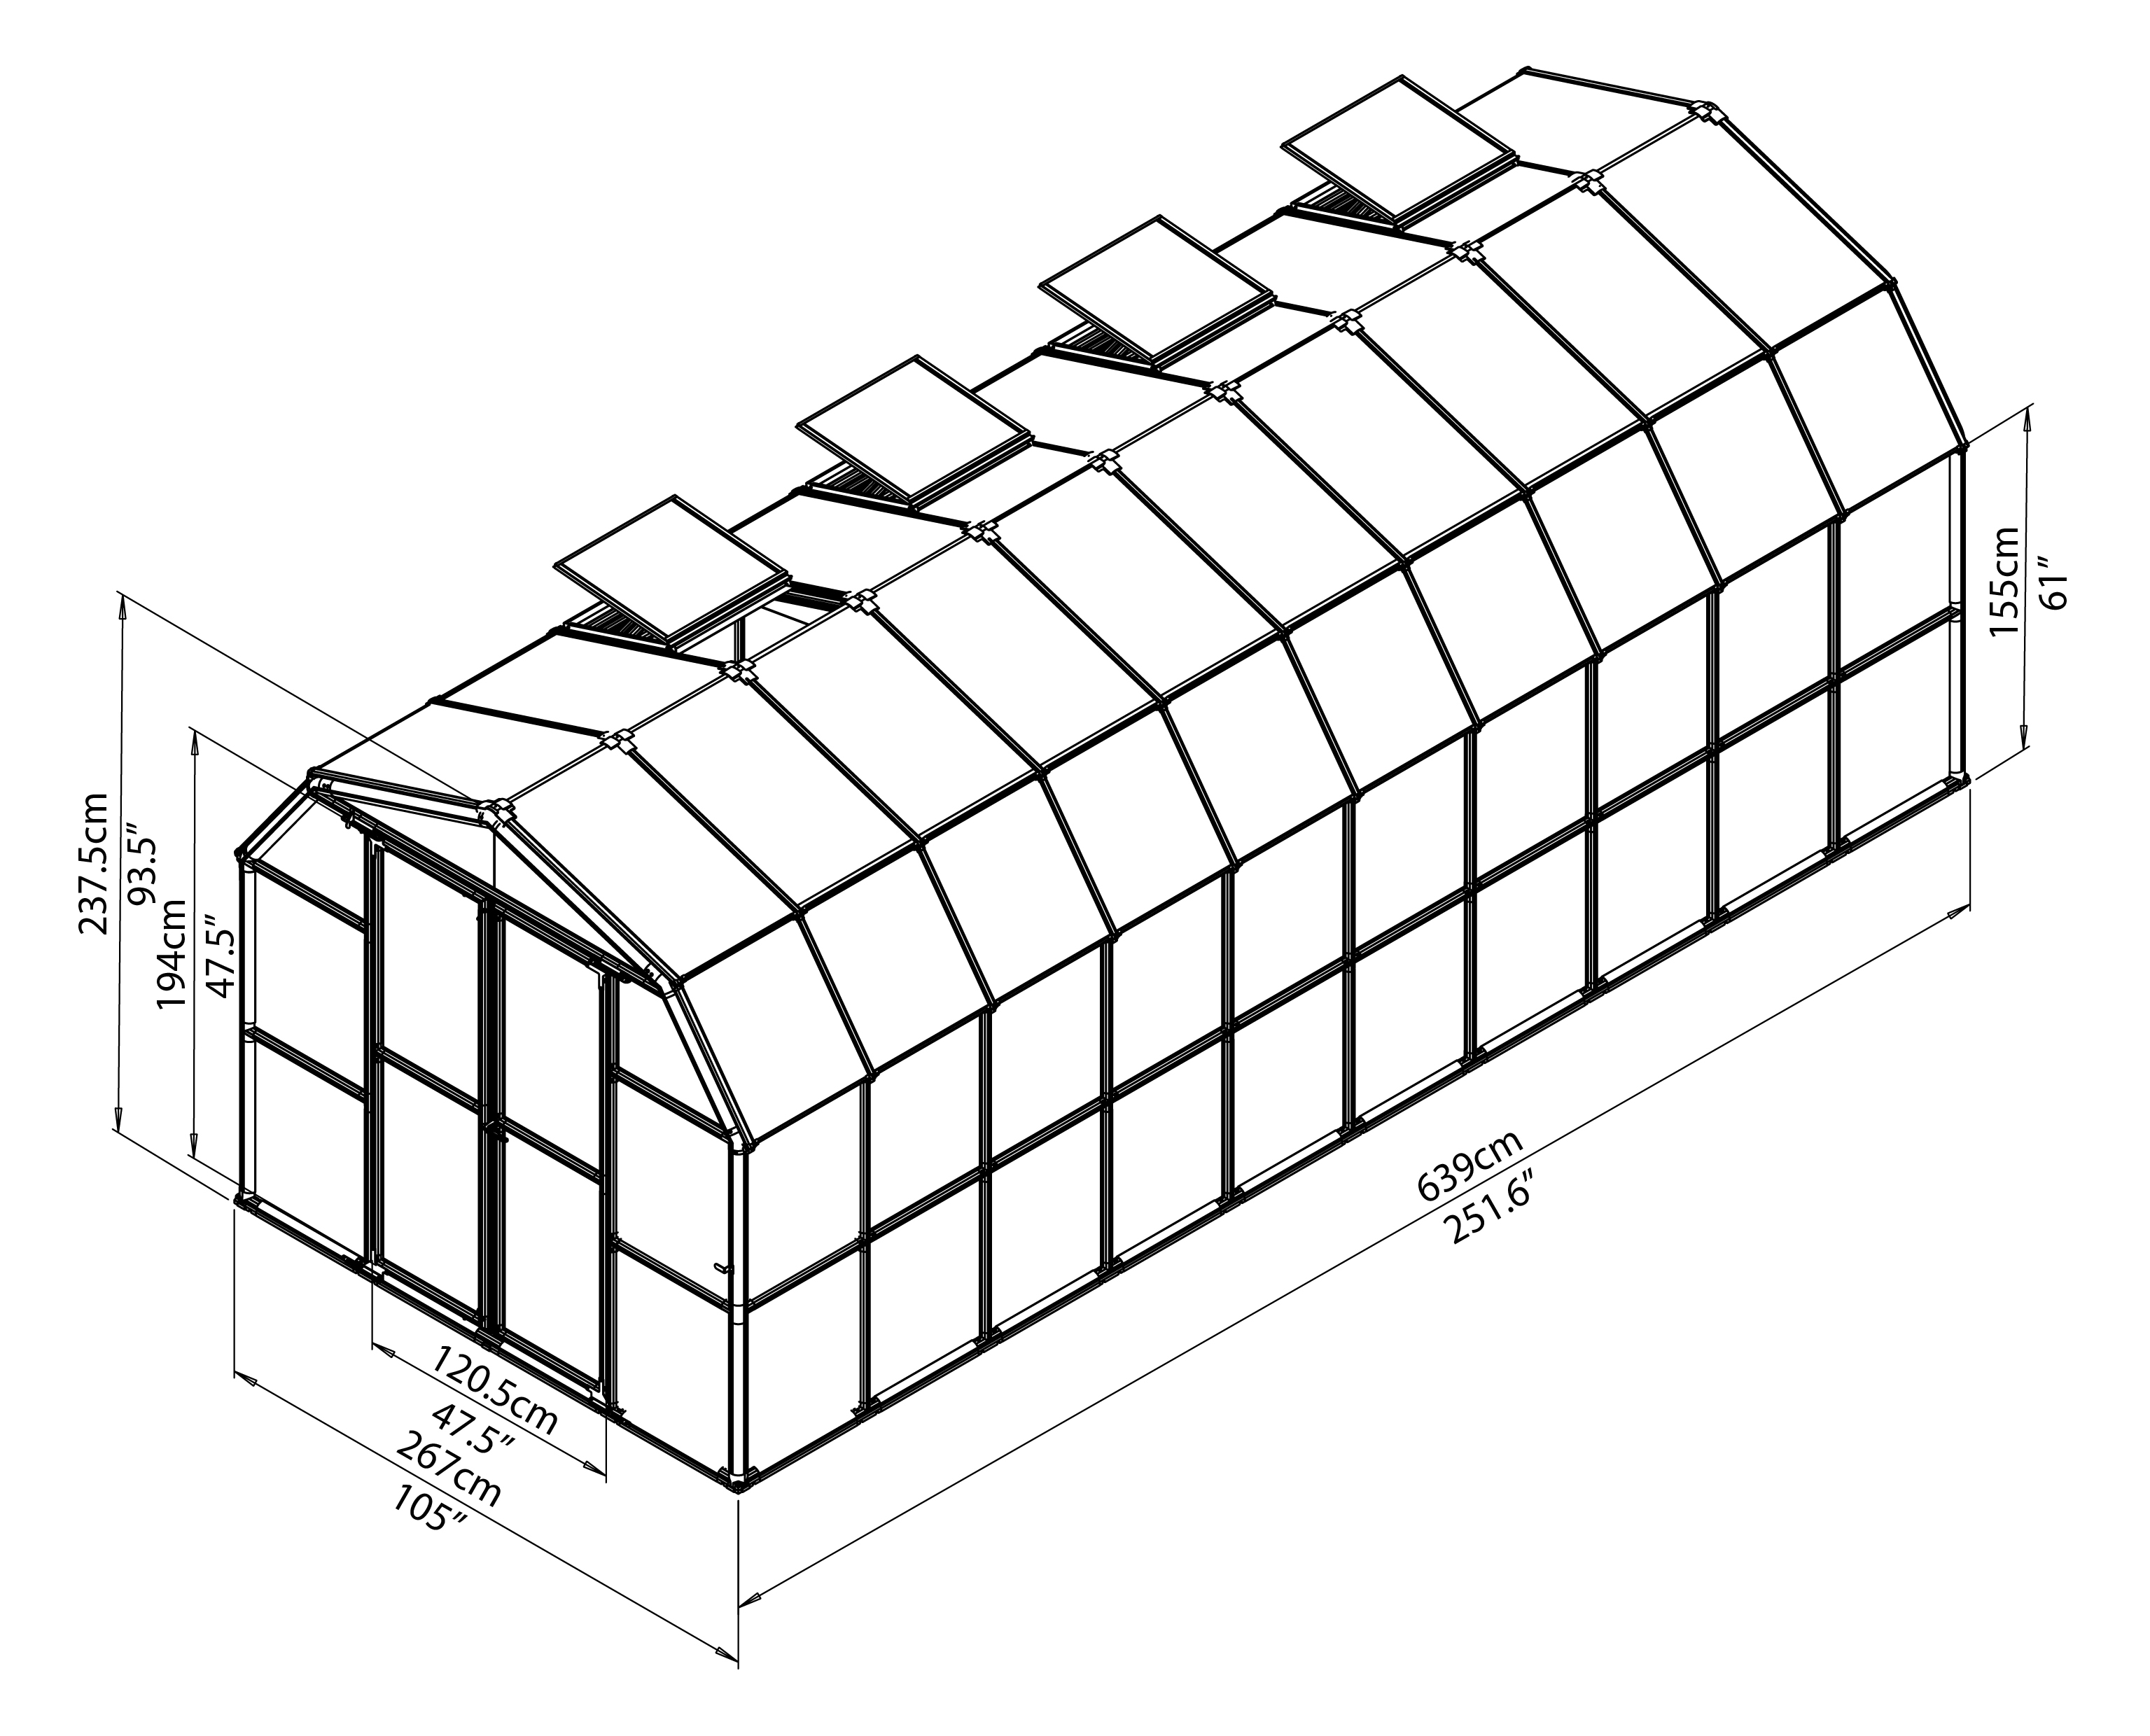 rion-greenhouses-grandgardener-prestige-opaque-8x20-drawing-isoview.jpg